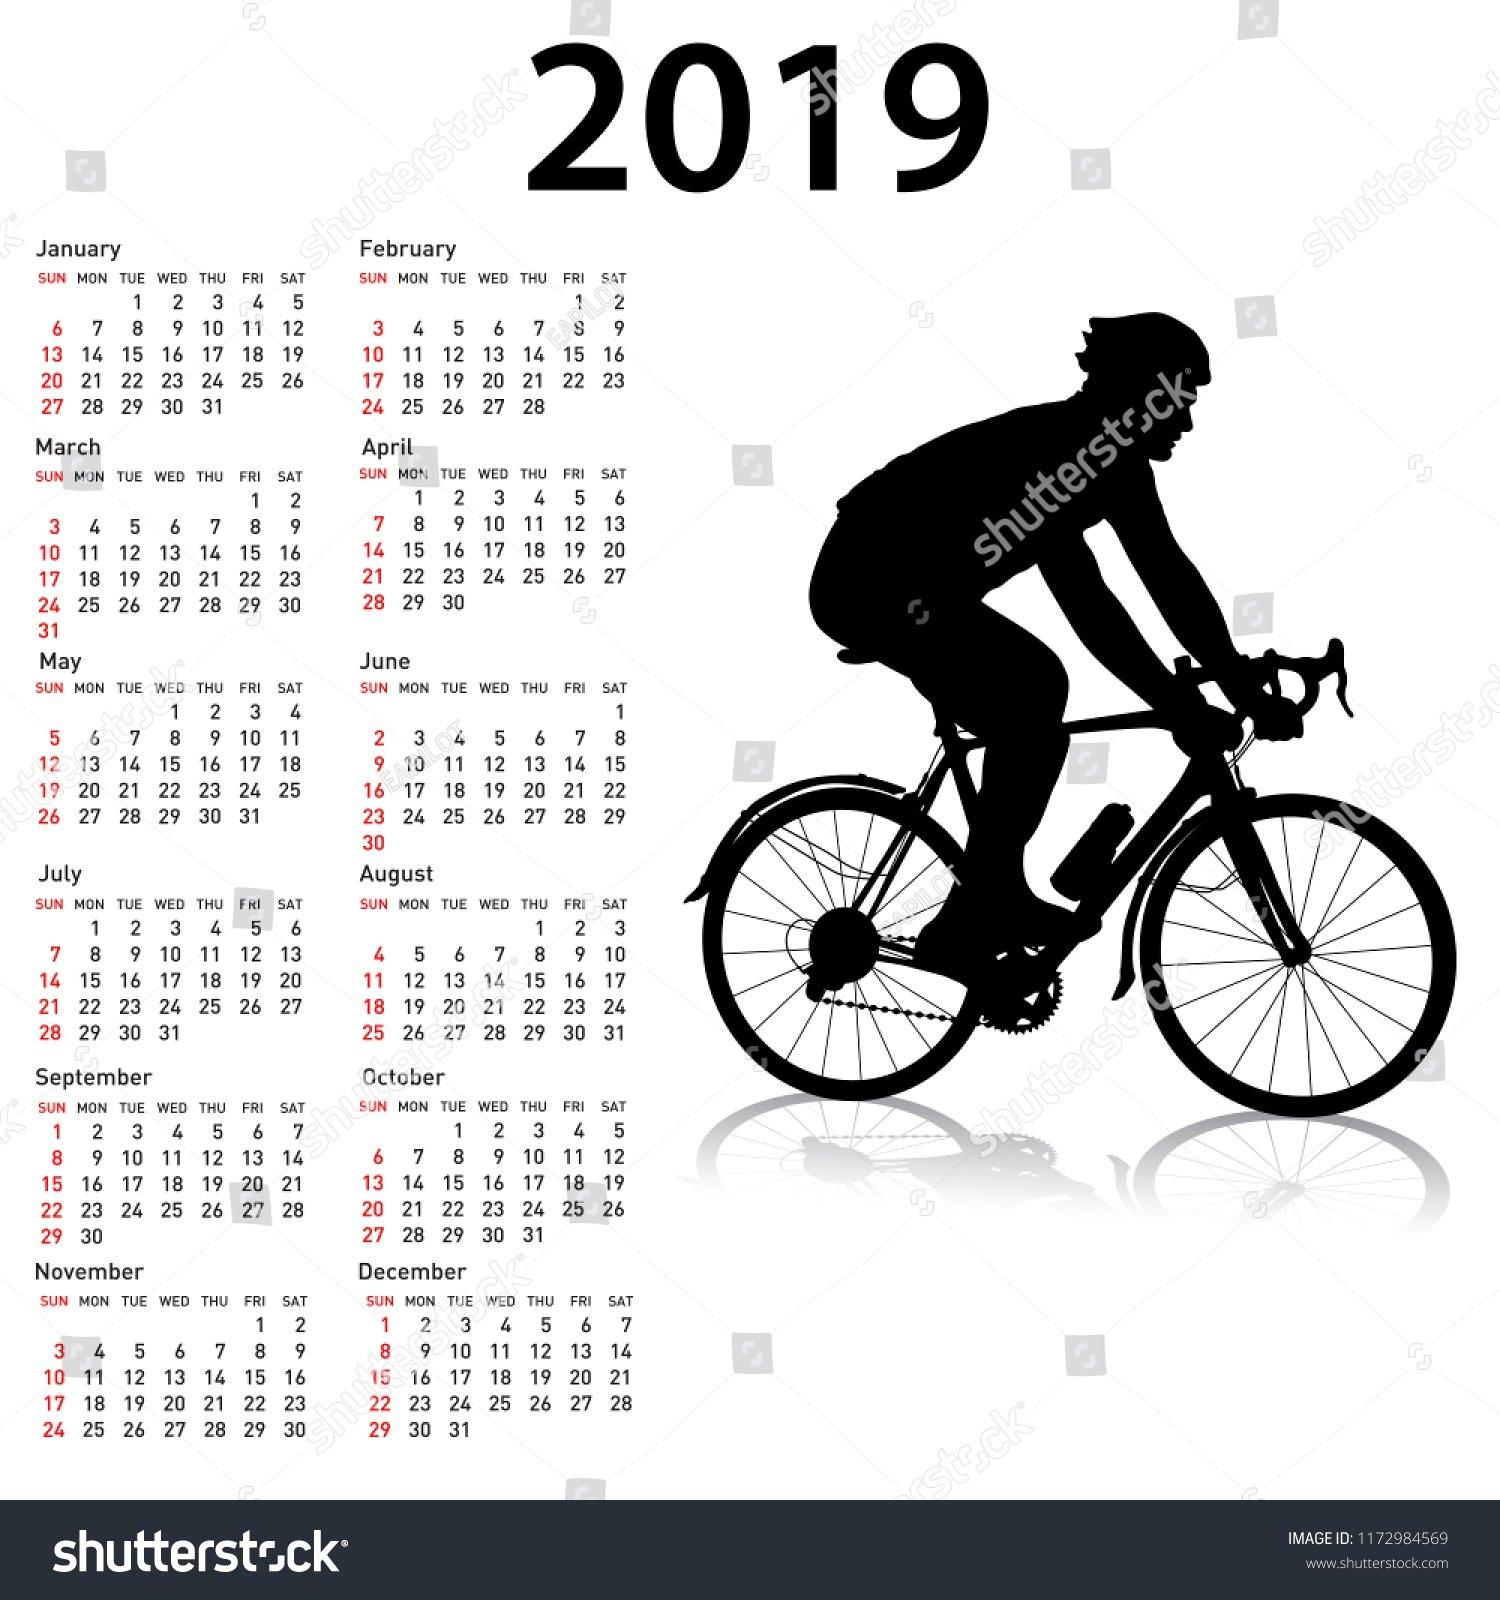 Sports Calendar 2019 Week Starts Sunday Stock Illustration 4 Week Period Calendar 2019